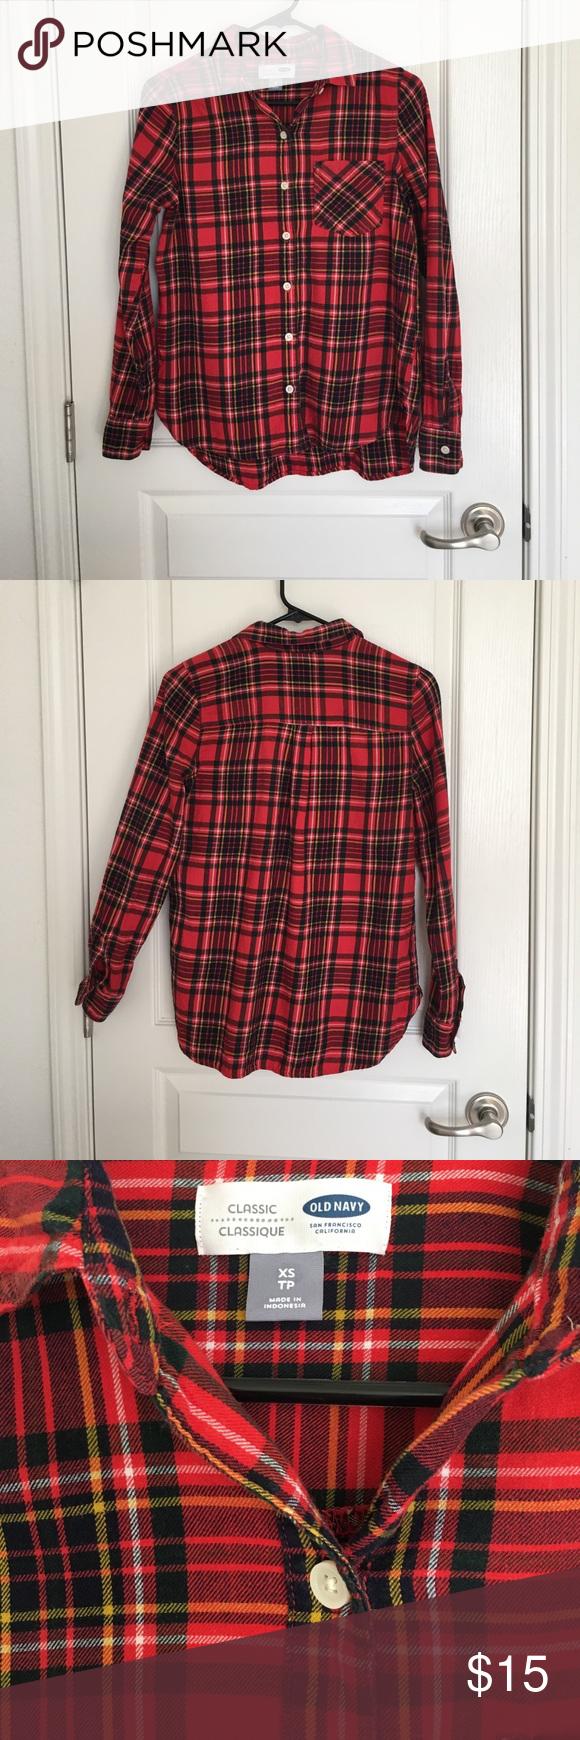 Flannel shirt xs  Old Navy Classic Flannel Plaid Shirt Sz XS  Plaid flannel Navy